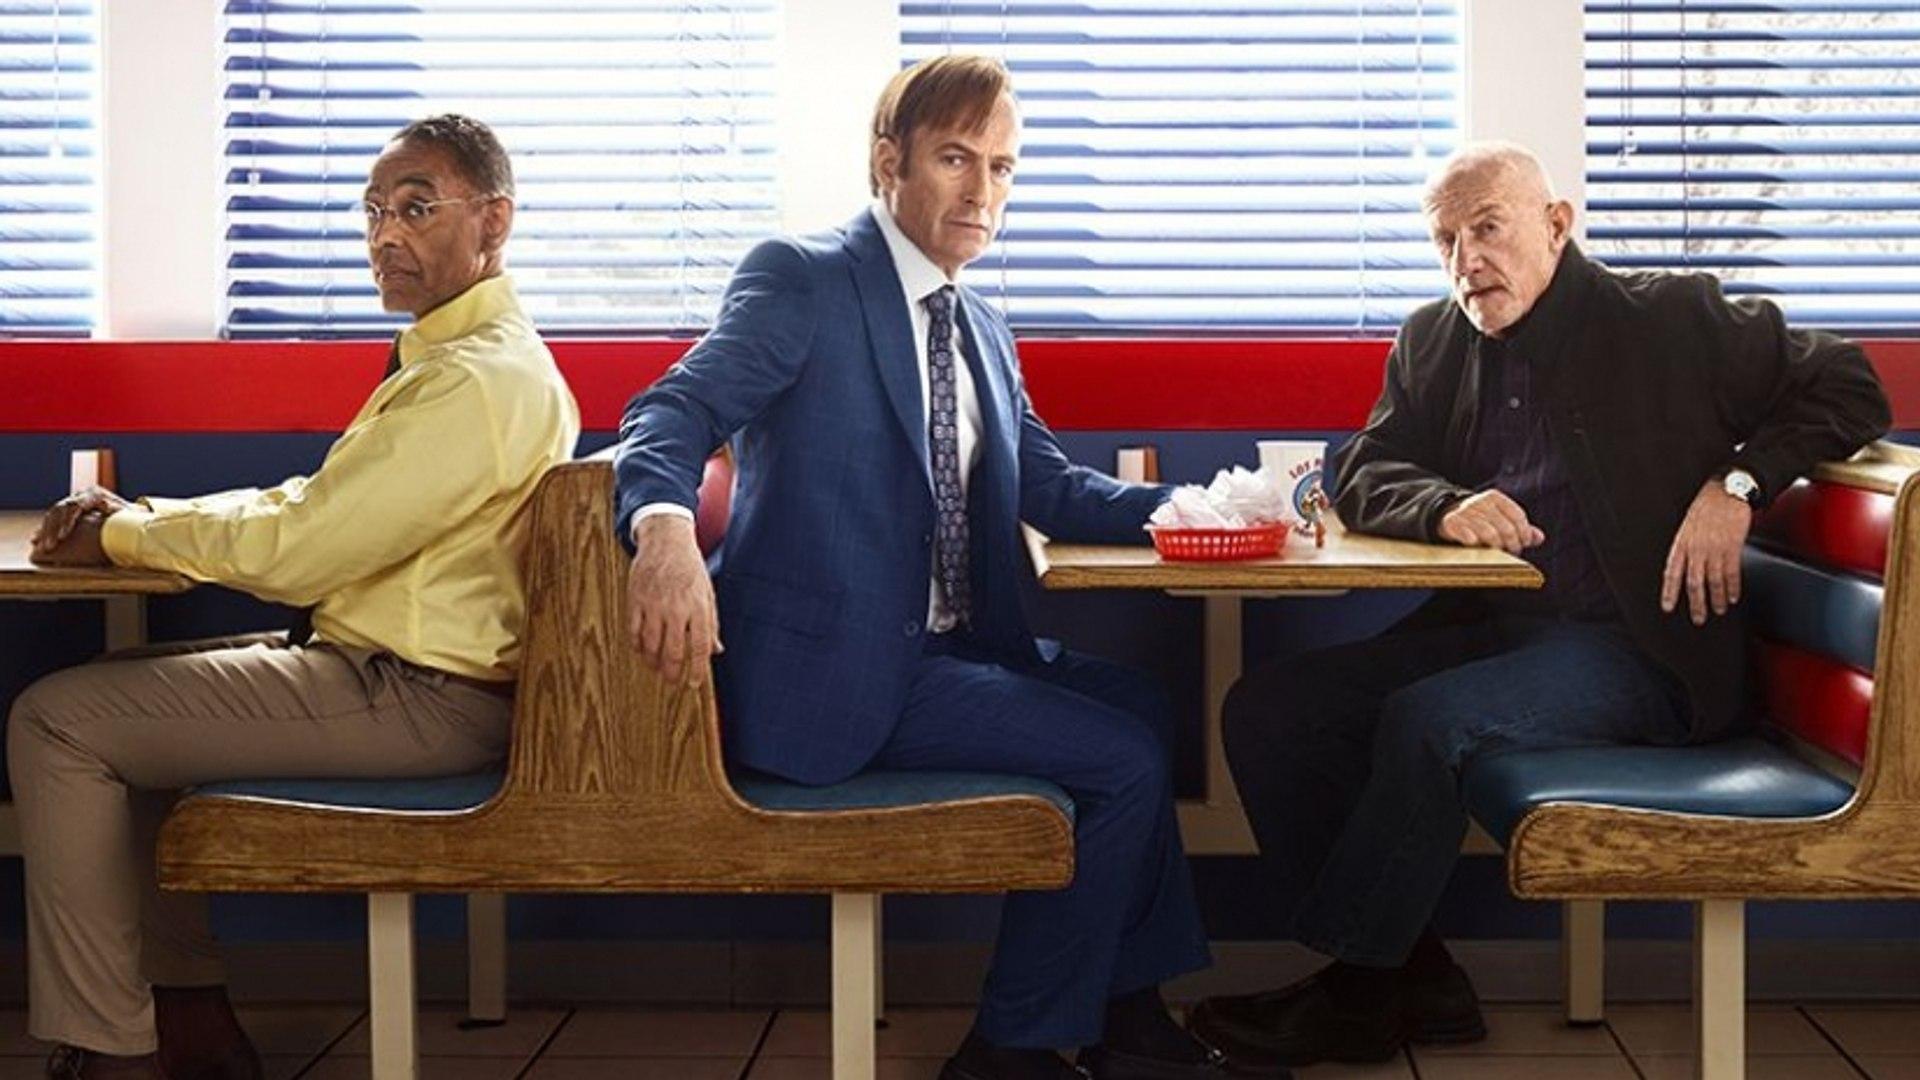 Better Call Saul Season 3 Episode 8 - The FOX Series